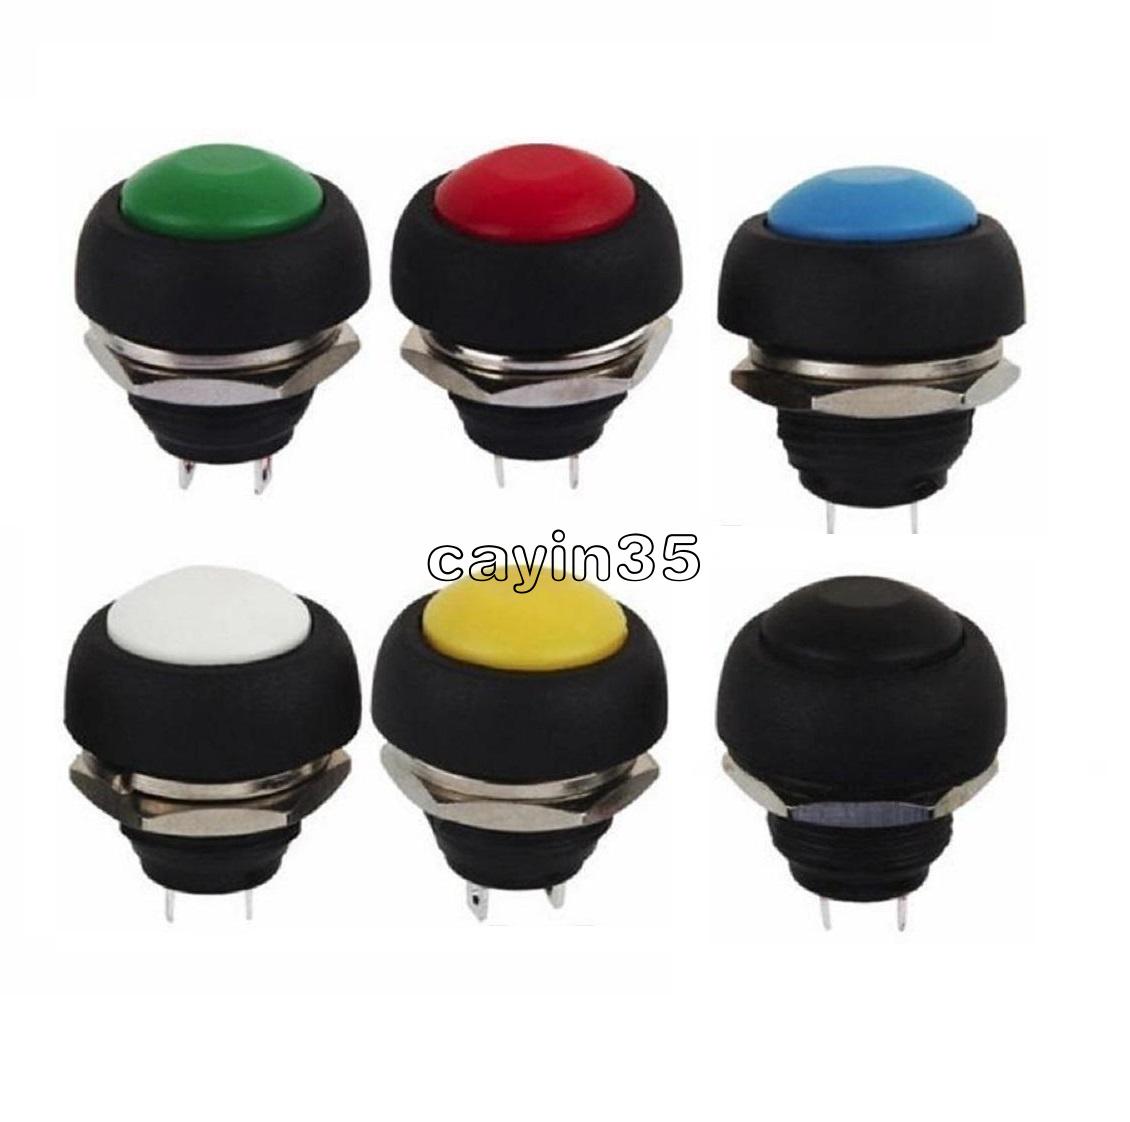 1Pcs Black 12mm Waterproof Momentary ON//OFF Push Button Round Mini K F4U4 I8D4